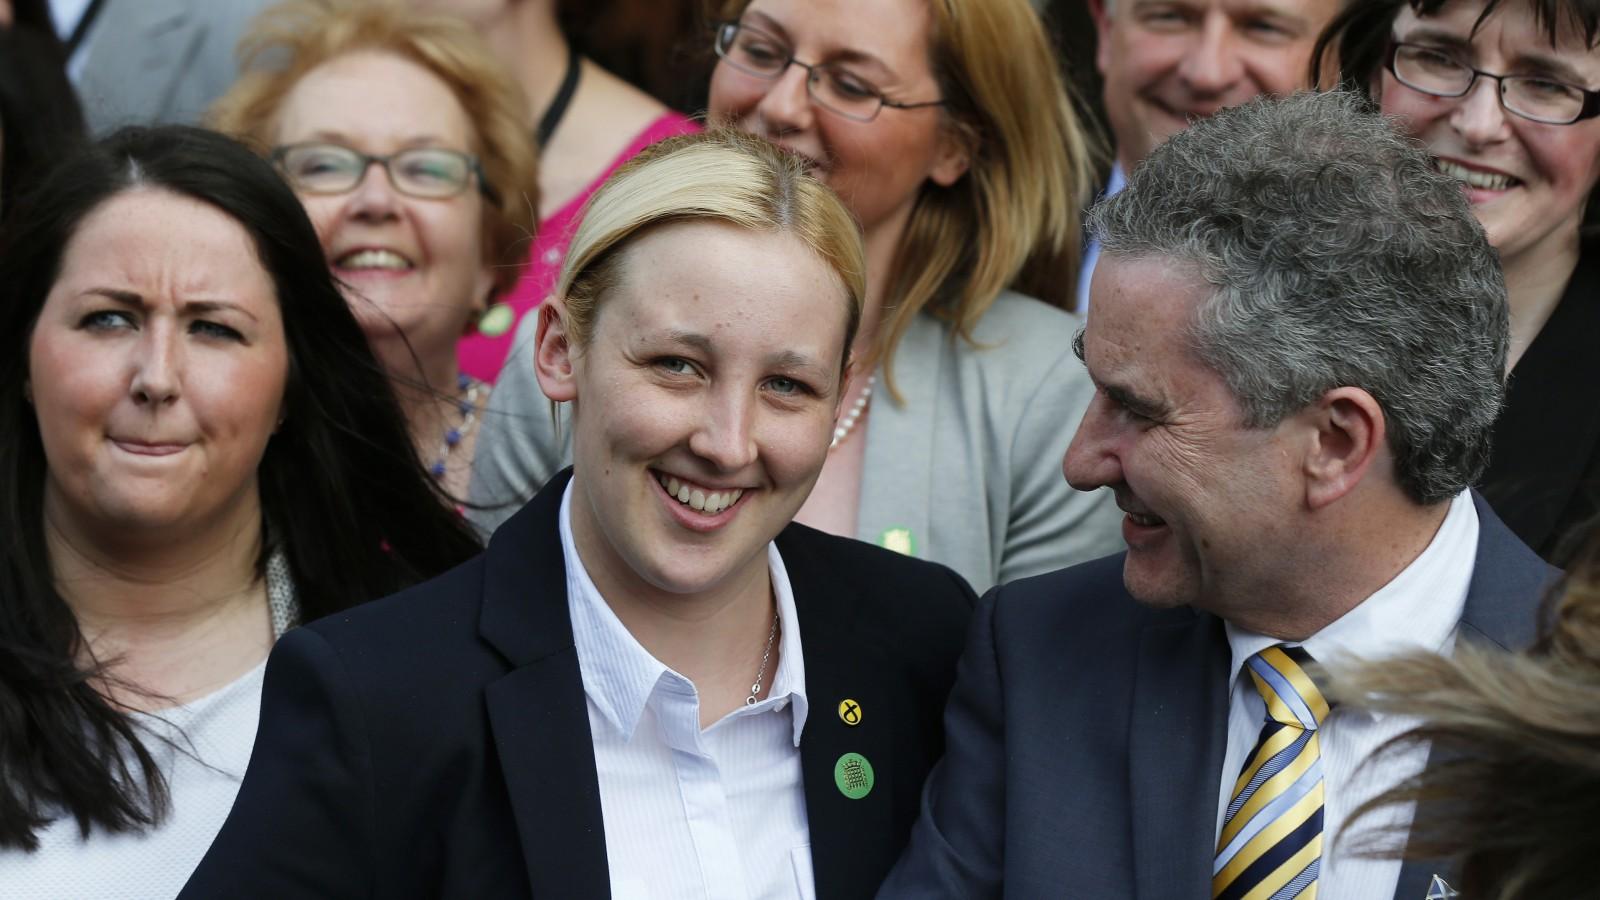 Scottish National Party MP, Mhairi Black .